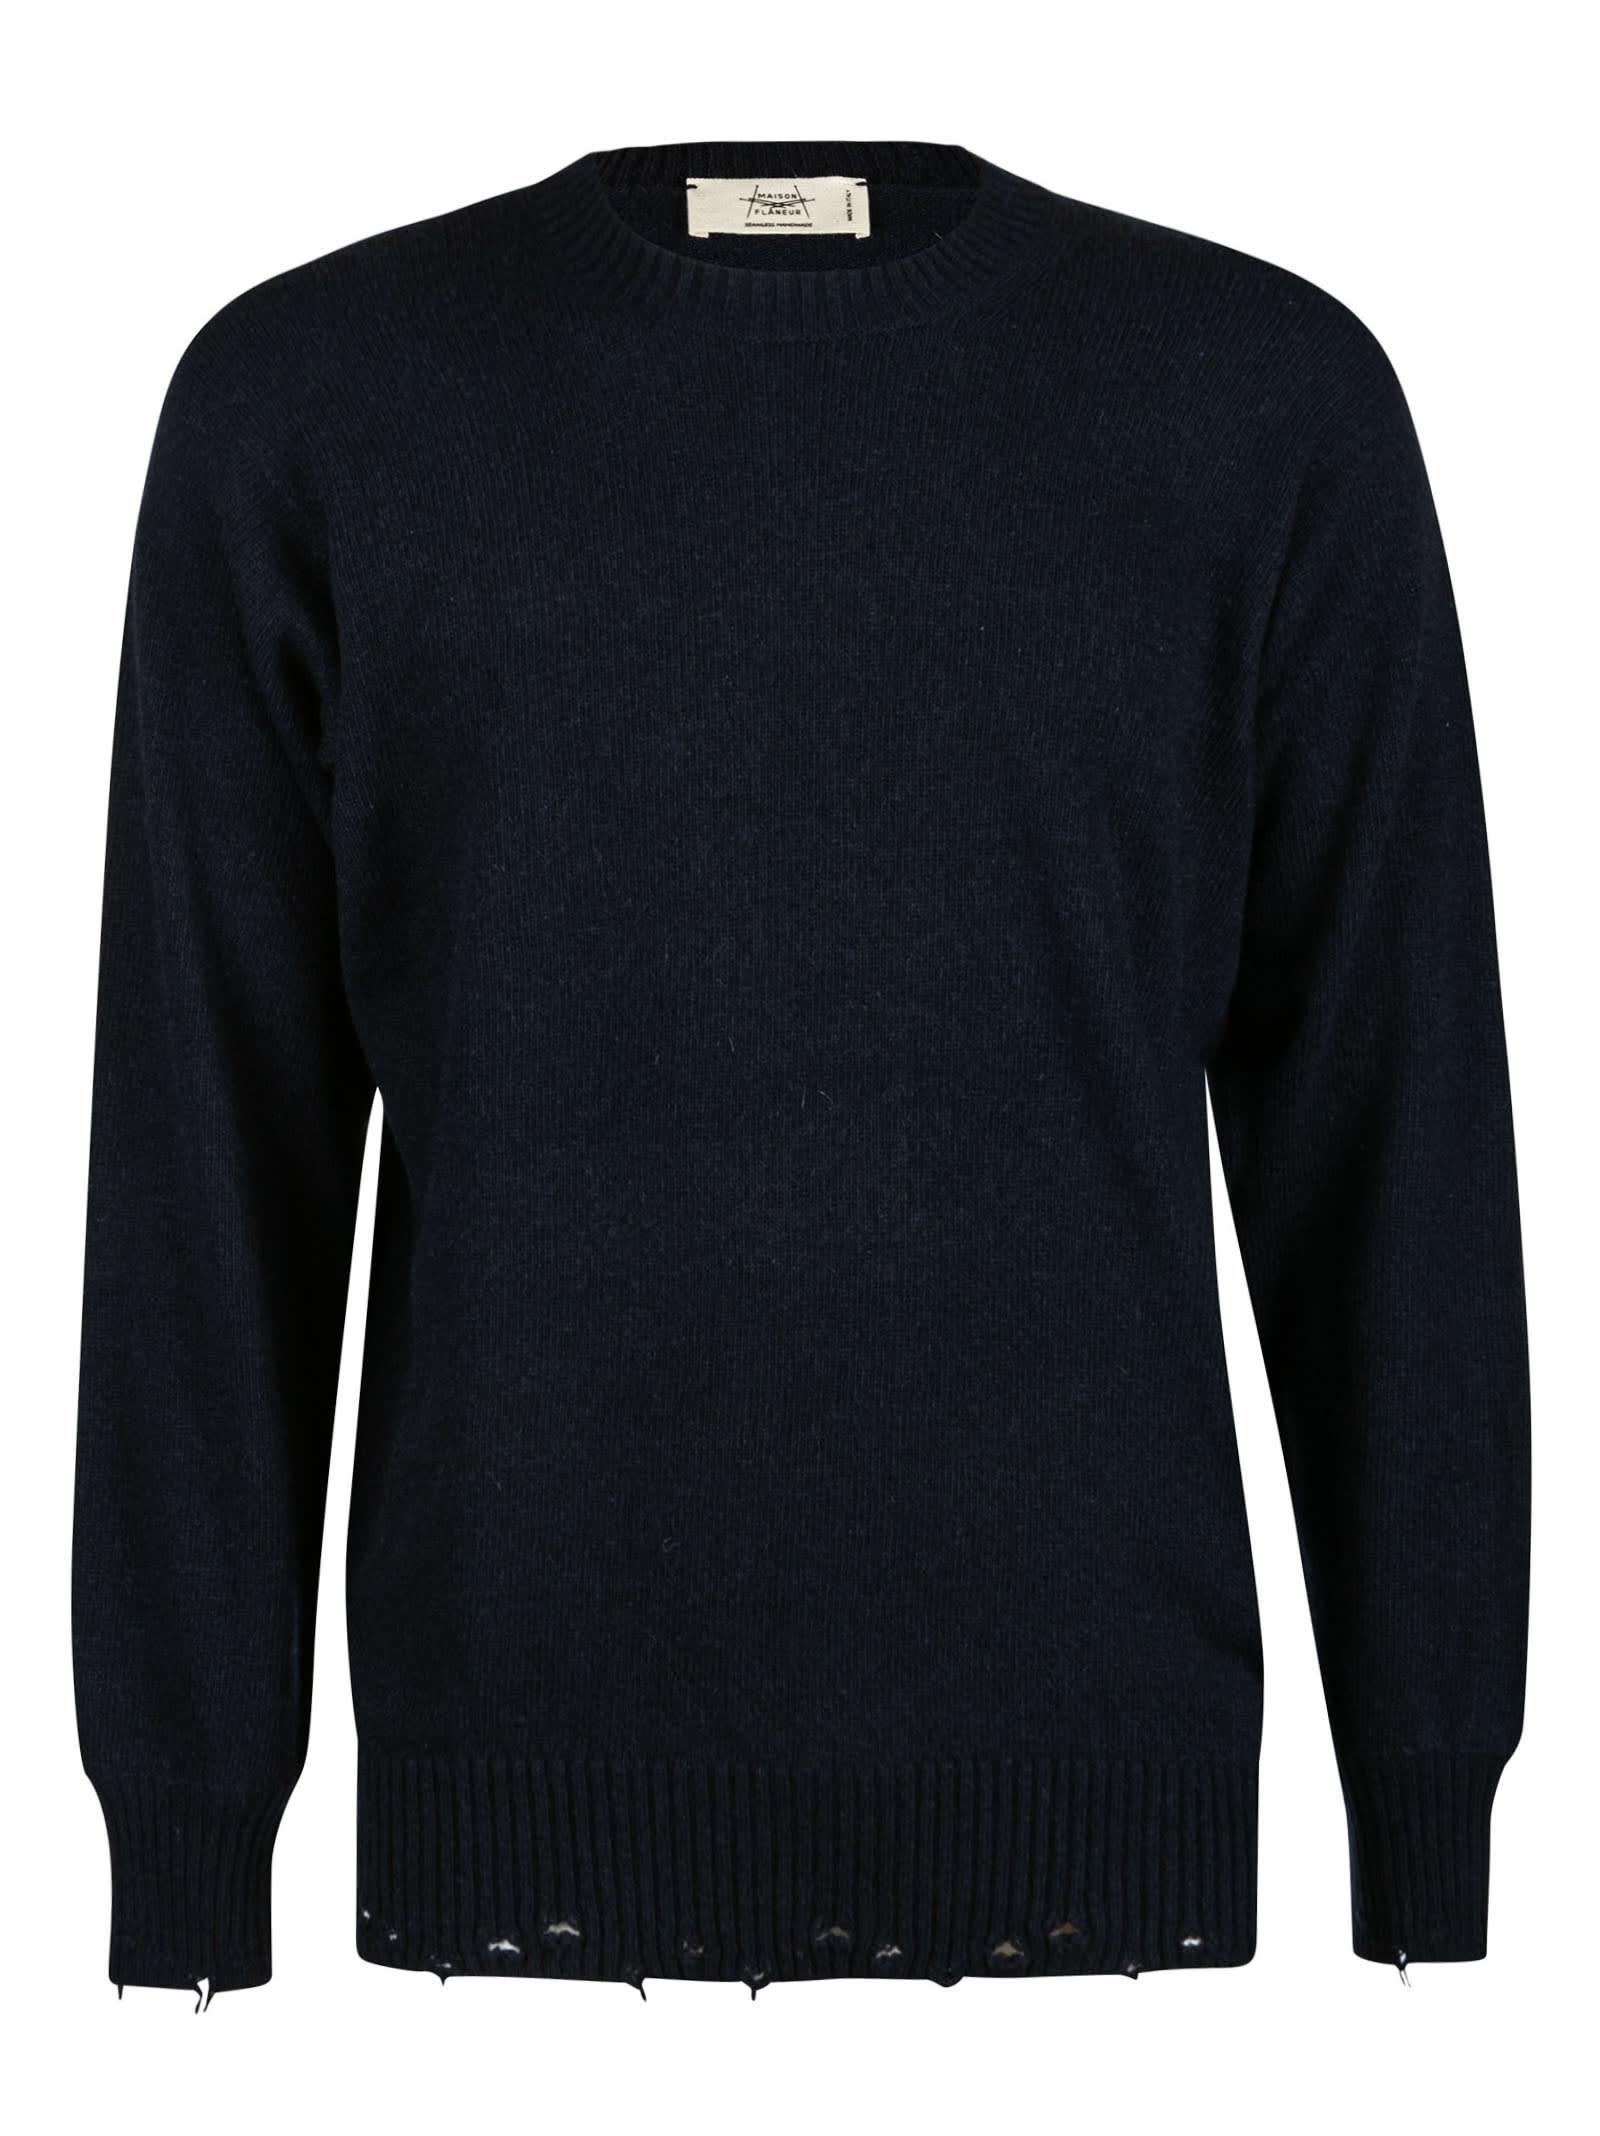 Distressed Effect Plain Sweater